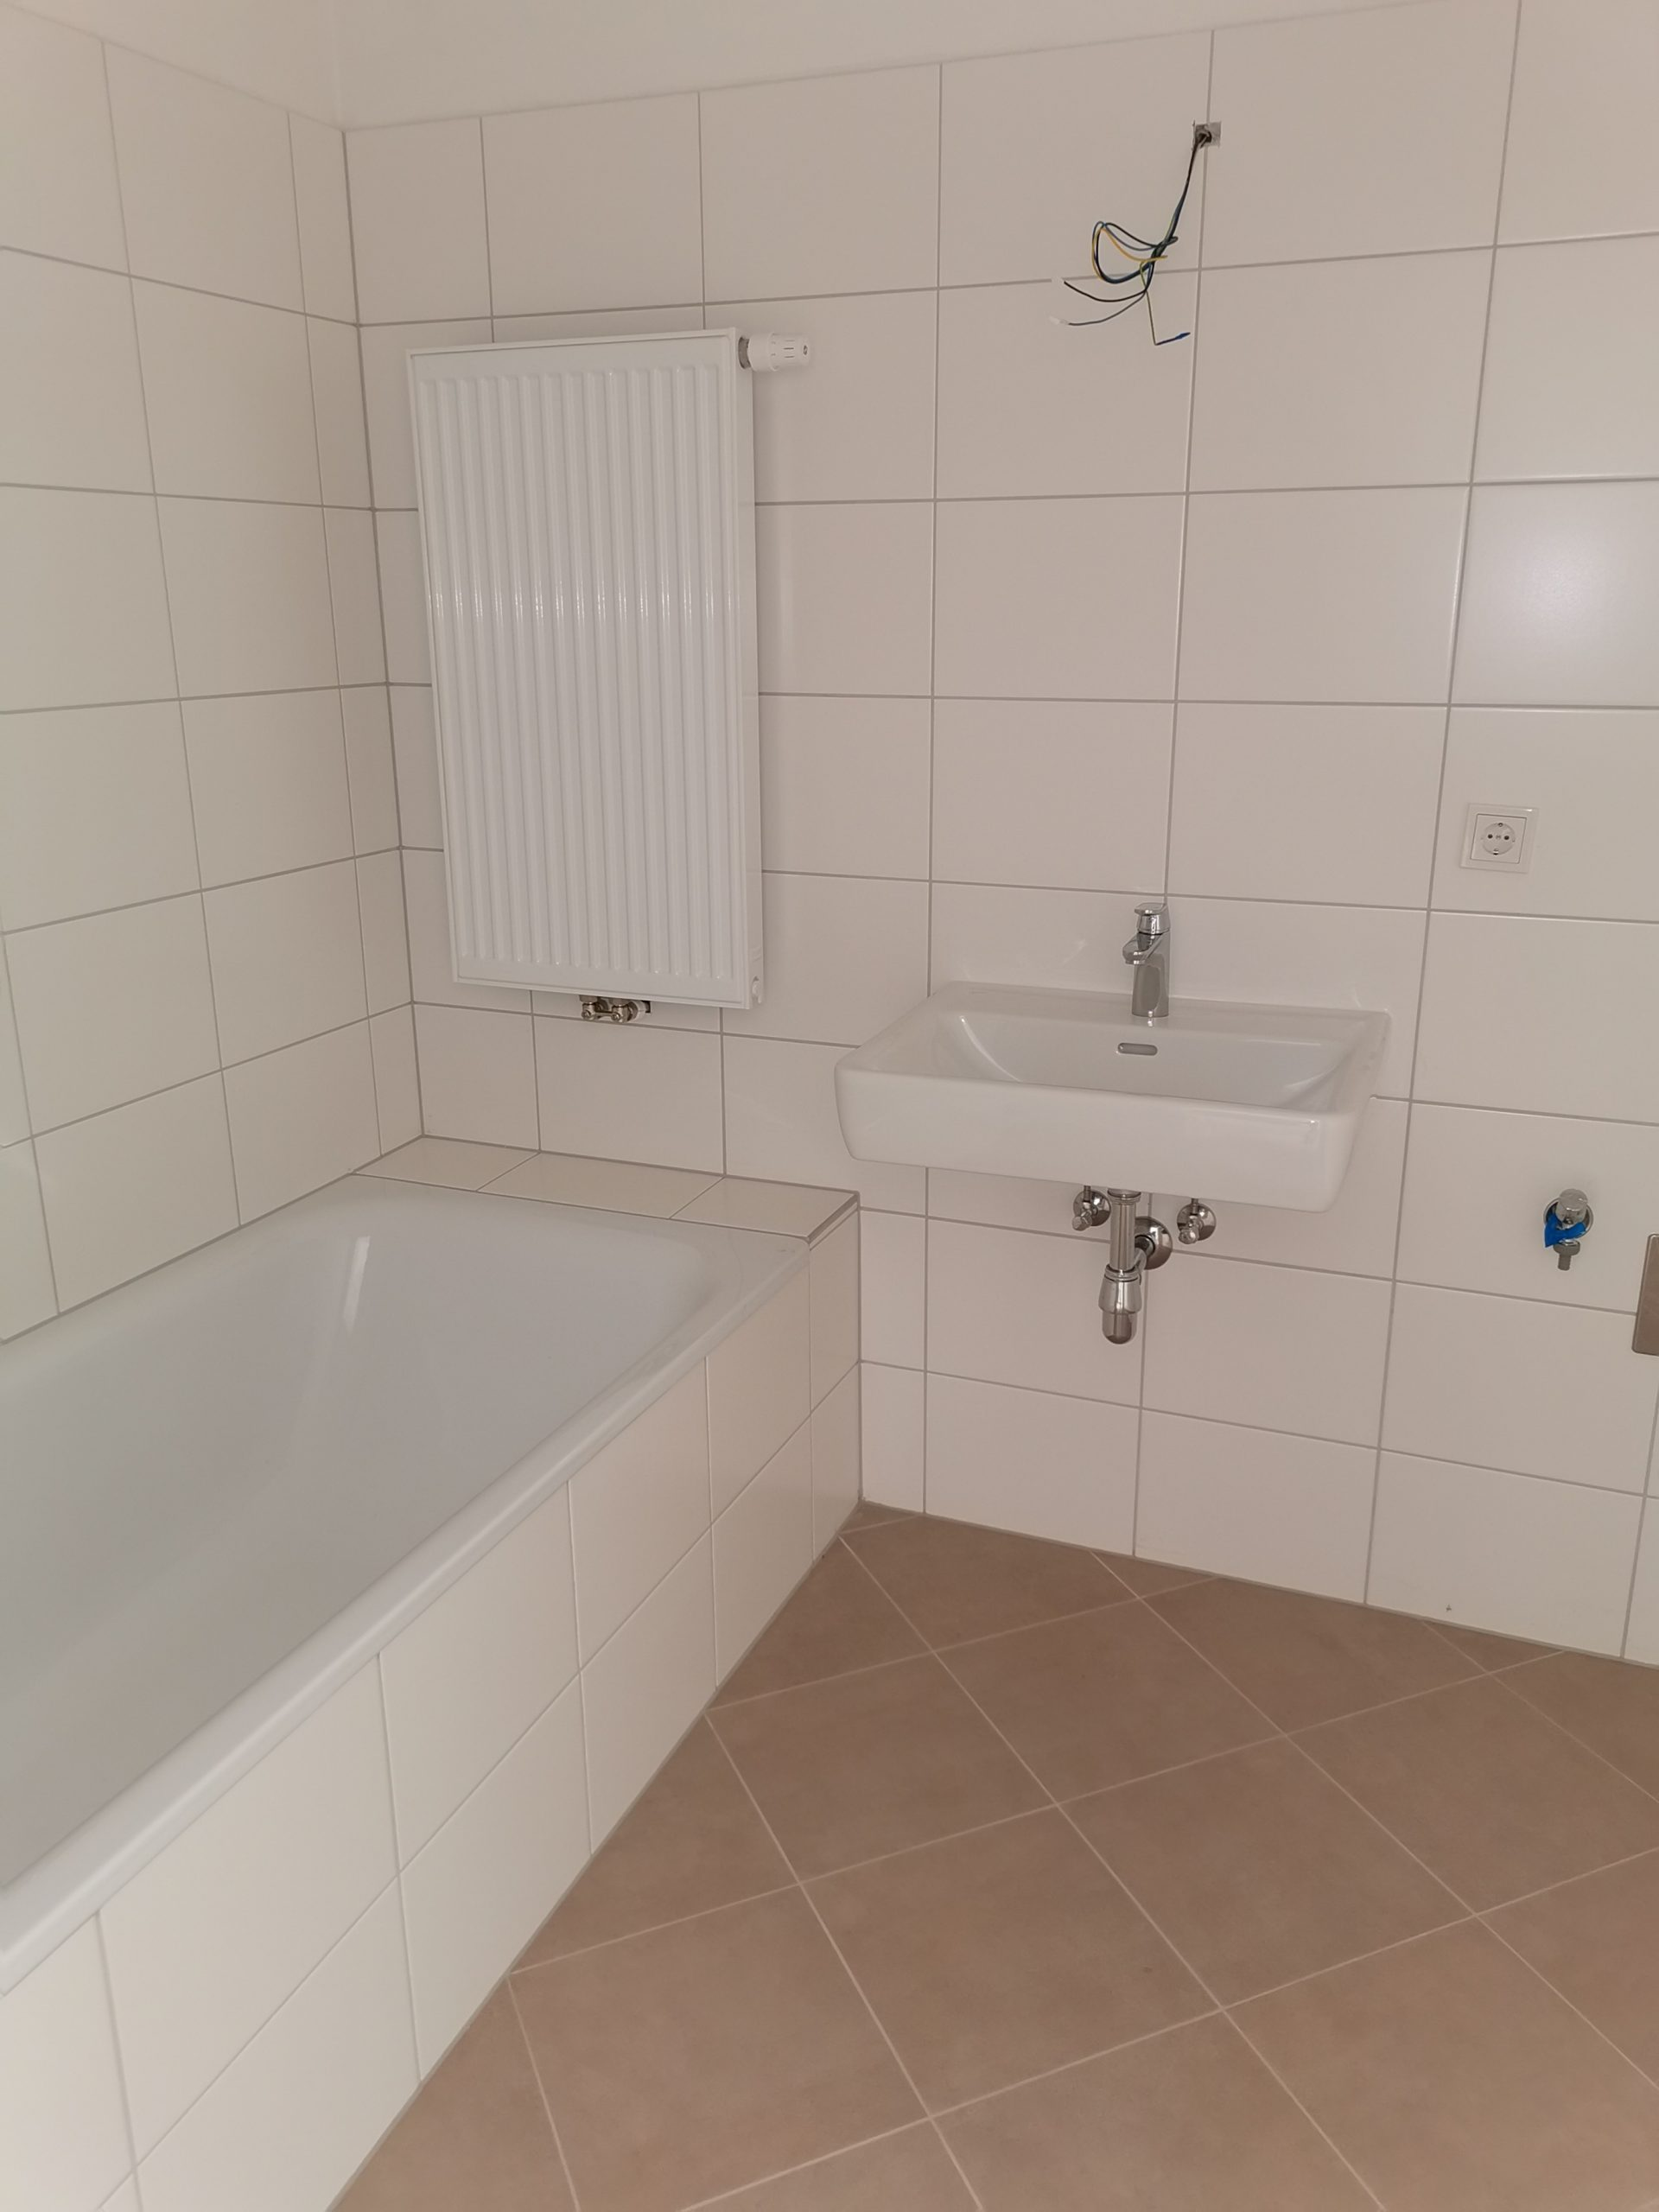 Immobilie von Kamptal in 3730 Eggenburg, Horn, Eggenburg VII - Top 107 #9